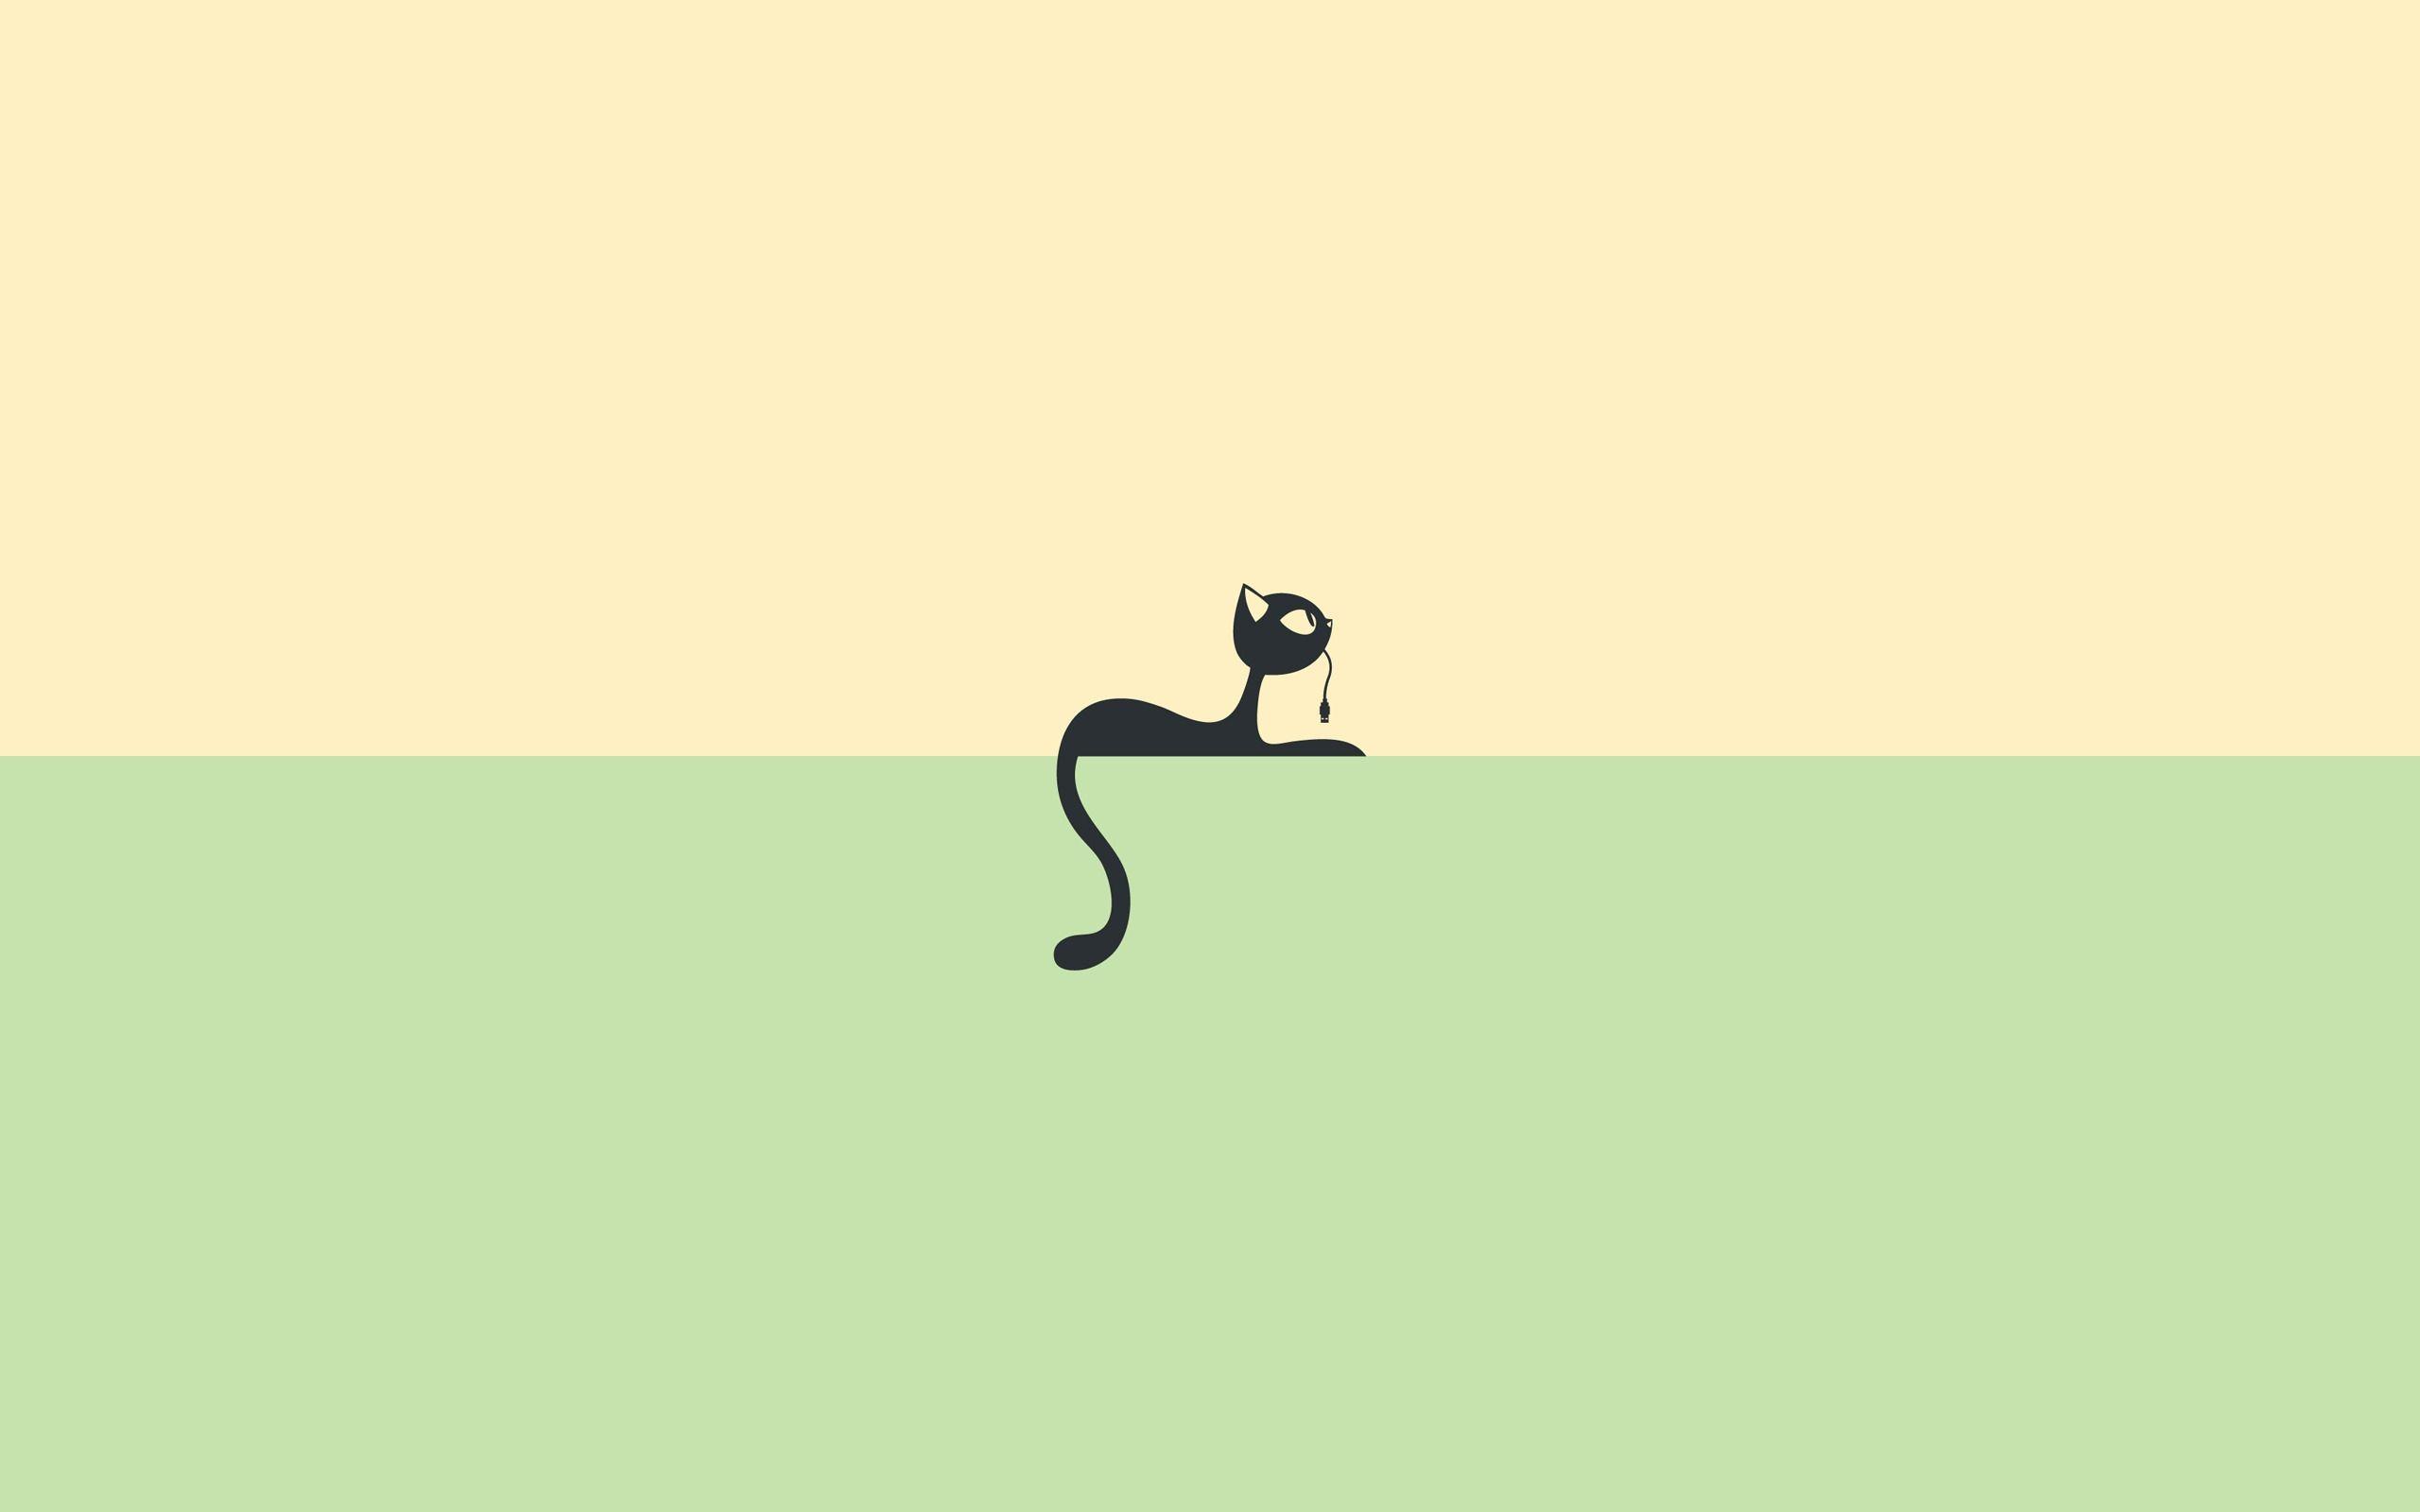 b67e7f620 Wallpaper Original Cat Drawing Black Green Background Download ...